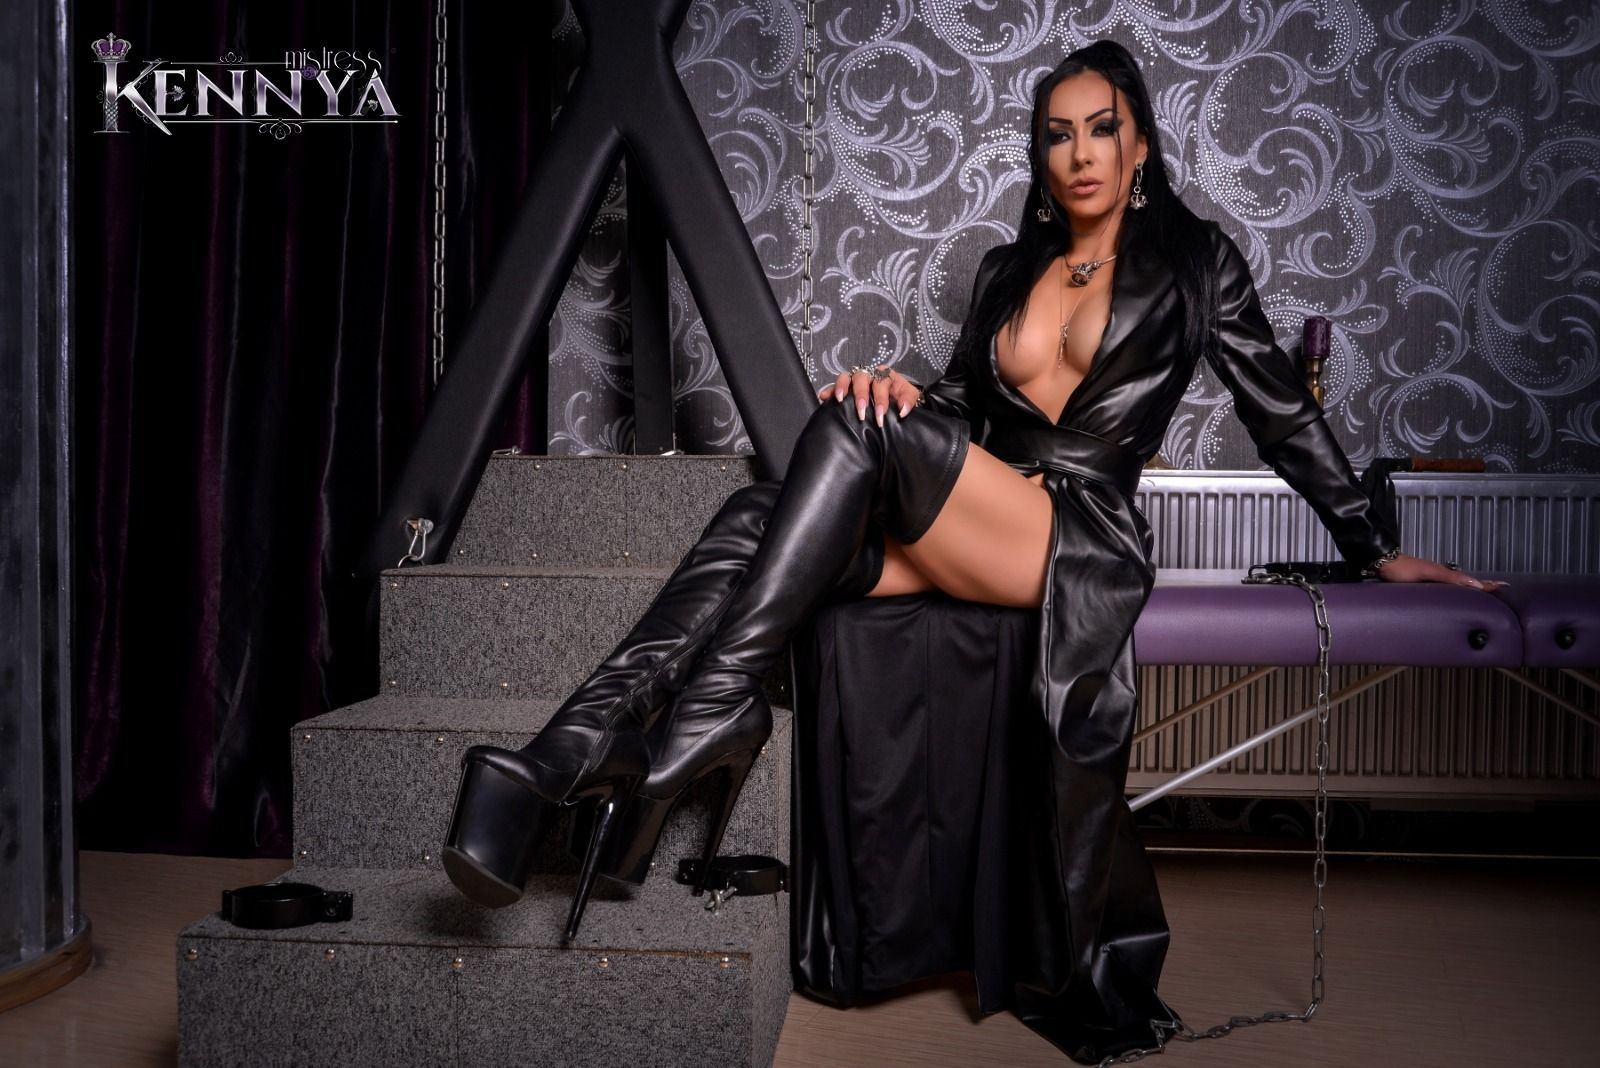 Footworship vancouver kinky dominatrix office doormat training miss jasmine